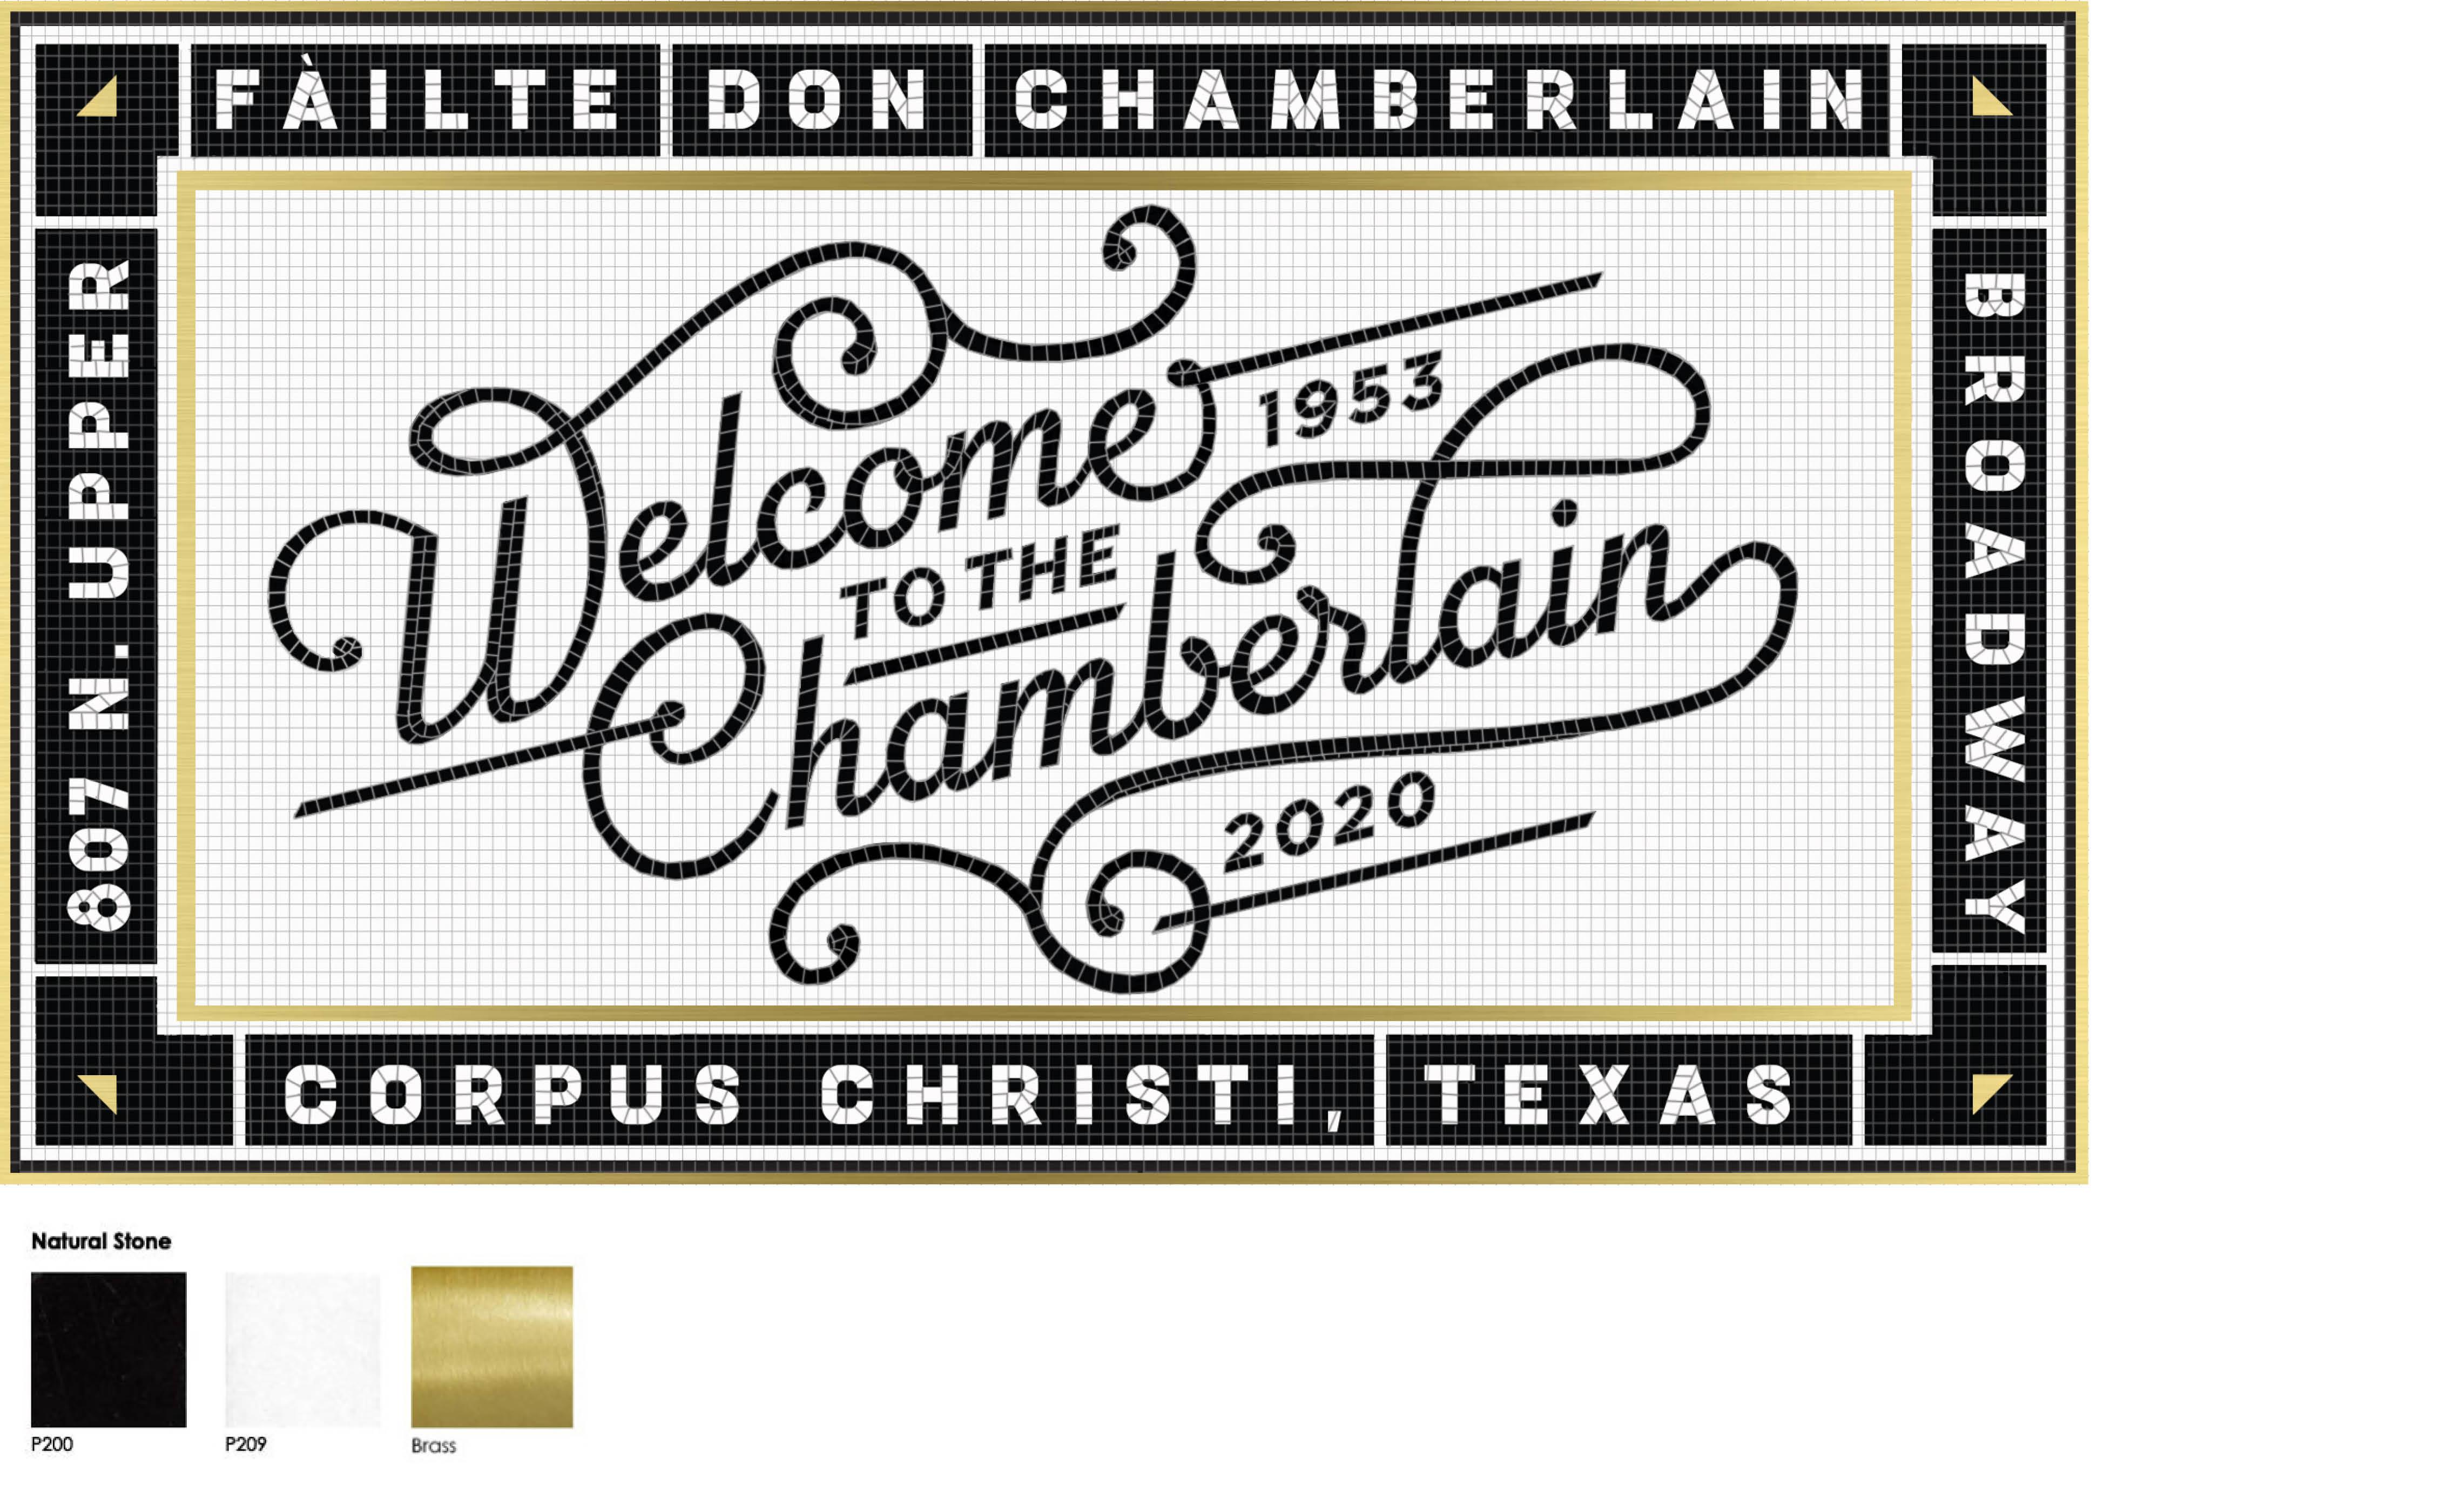 The Chamberlain Rendering